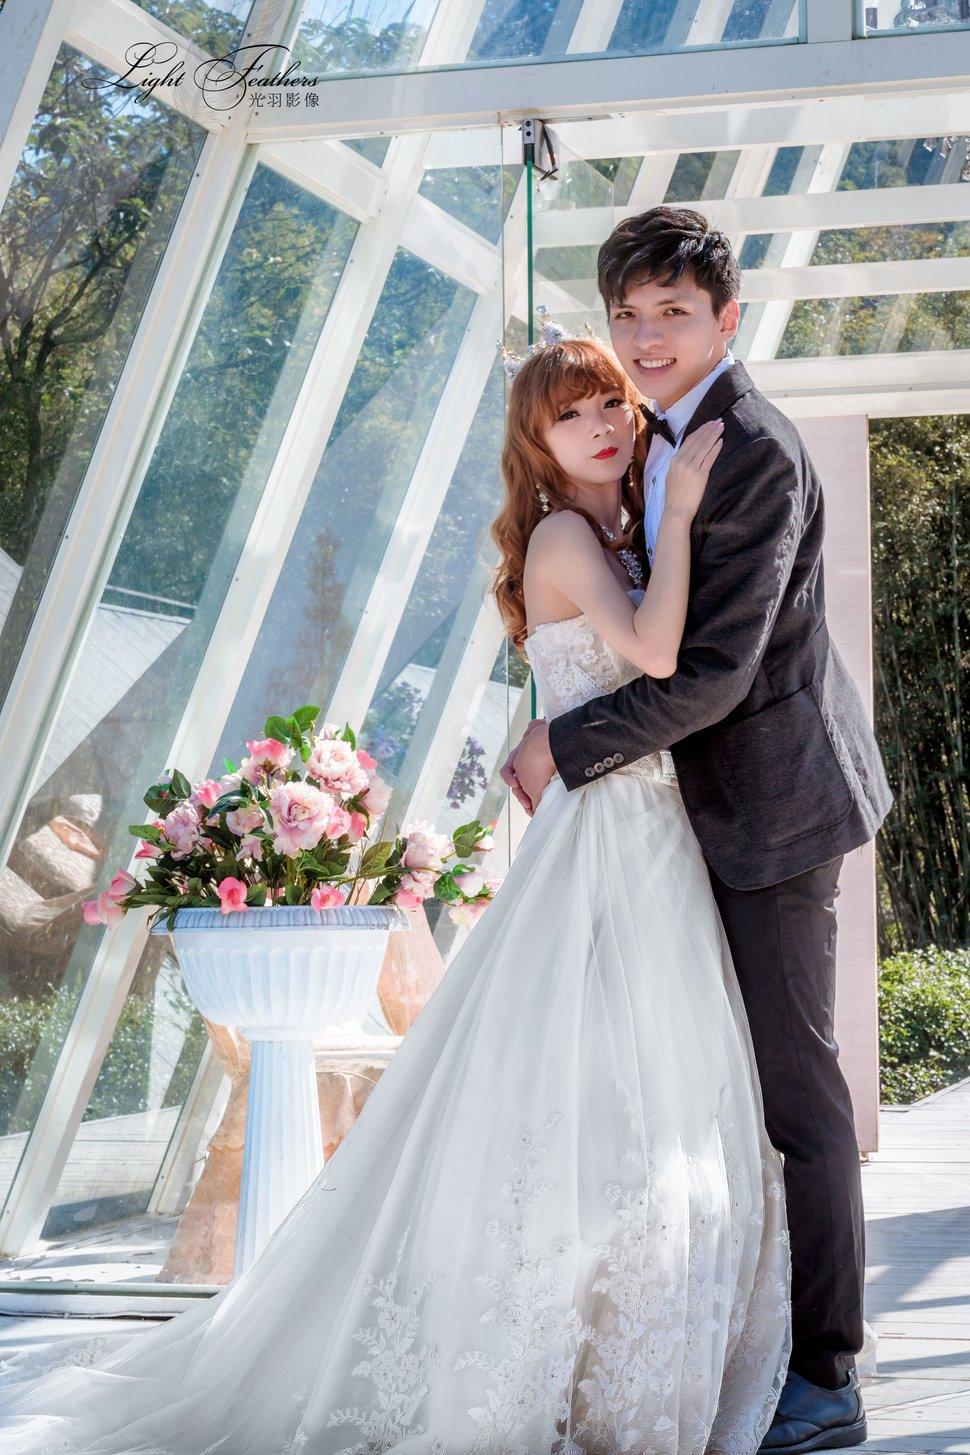 5D4_1766_副本 - Promaker婚禮紀錄攝影團隊婚攝豪哥《結婚吧》